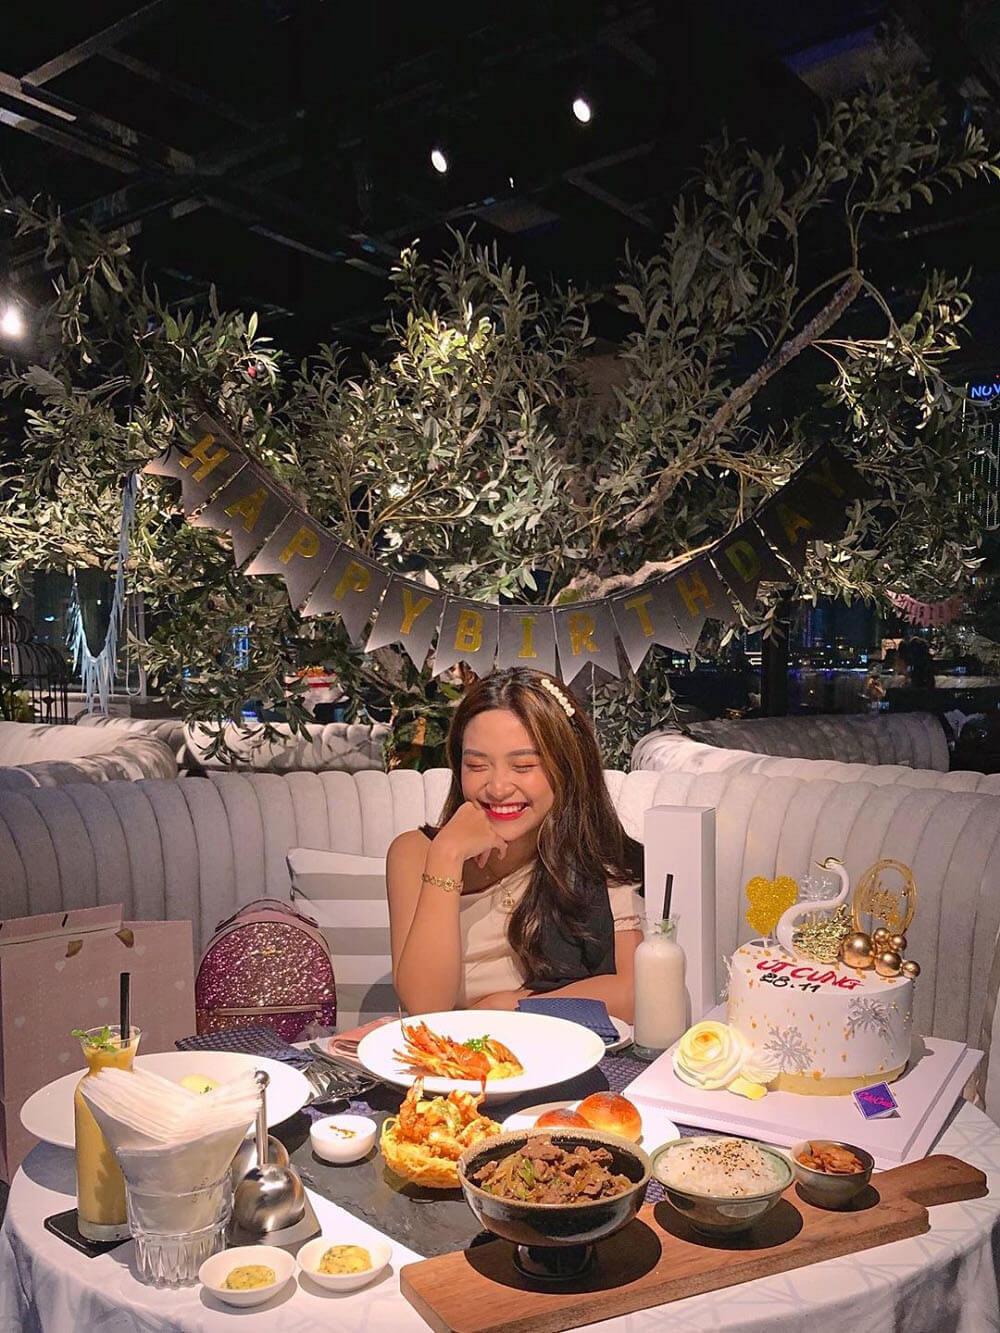 Uu Dai Tri An Khach Hang Nhan Dip New Orient Hotel Da Nang Tro Lai Hoat Dong 02